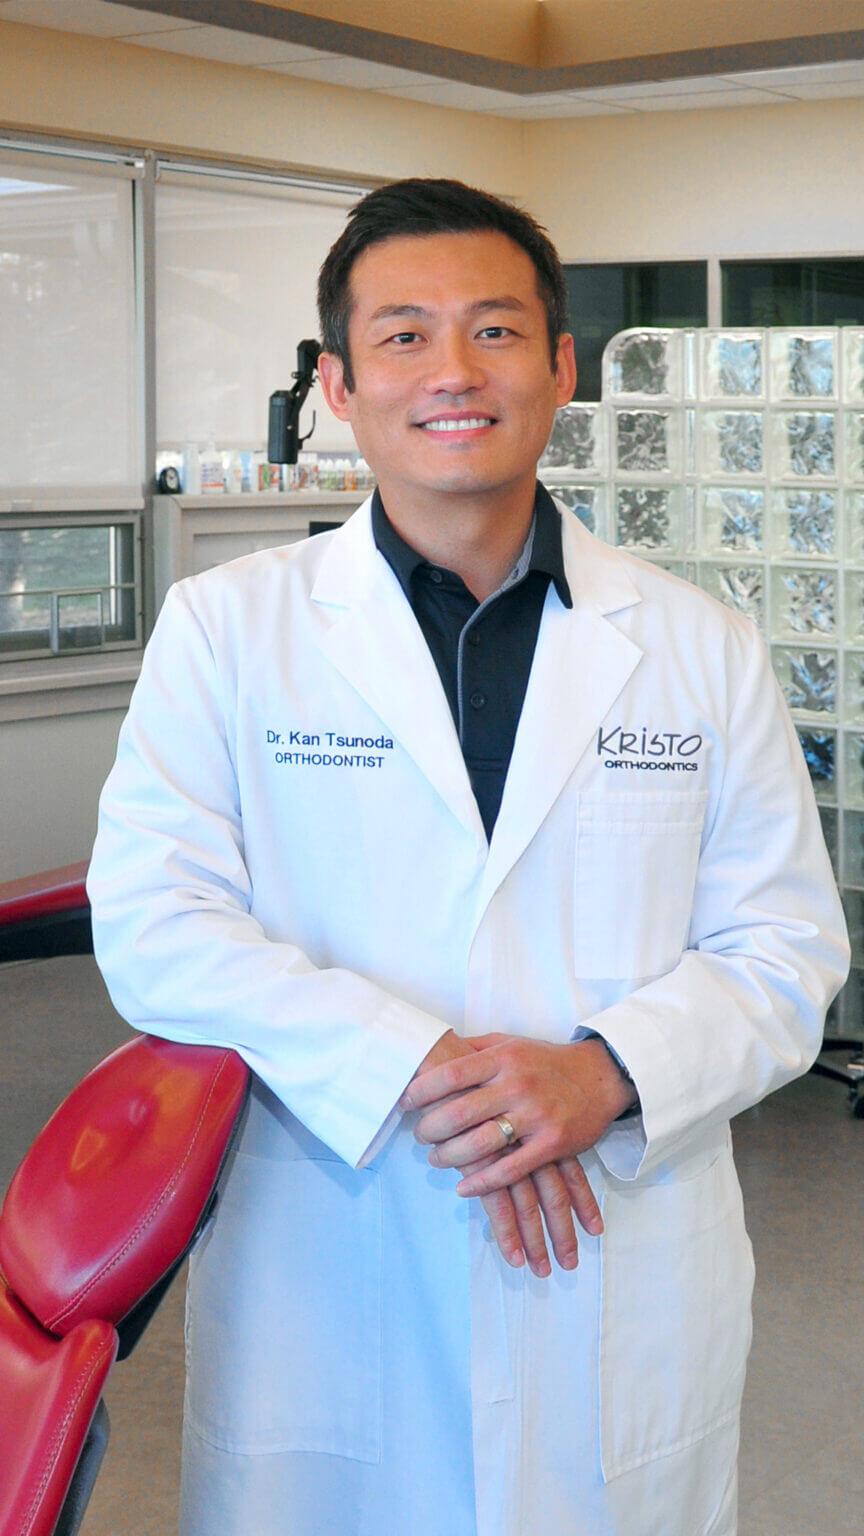 Dr. Kan Tsunoda - Orthodontic & Invisalign® specialist